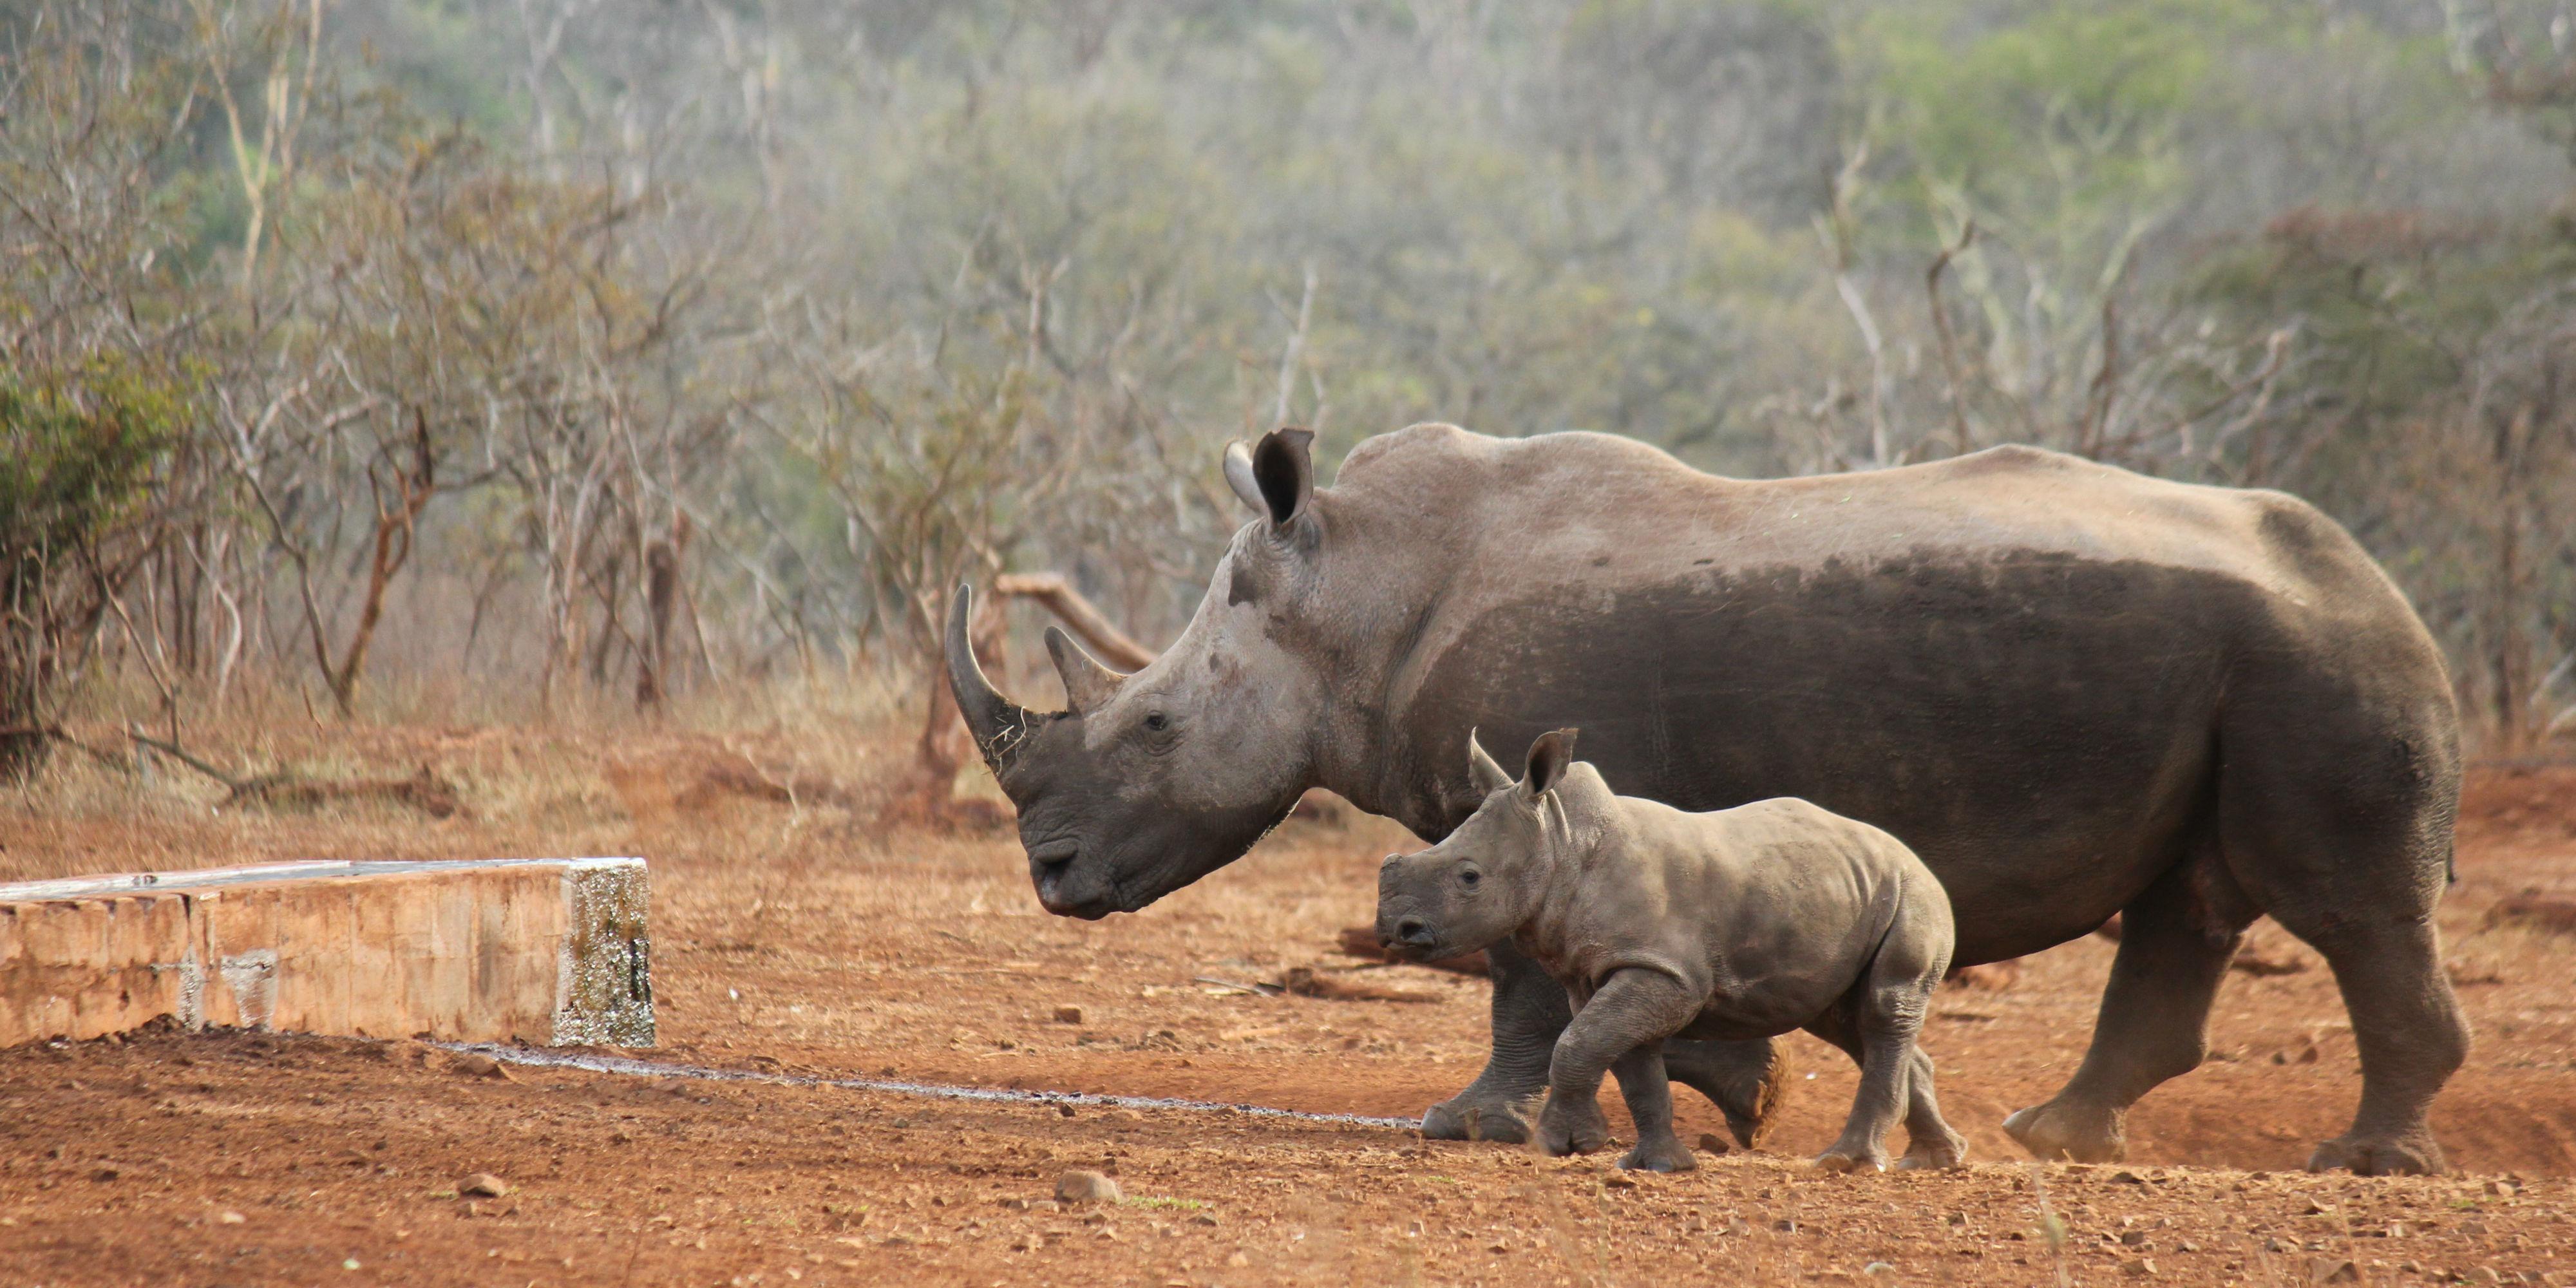 Join a volunteer program towards rhino conservation efforts.